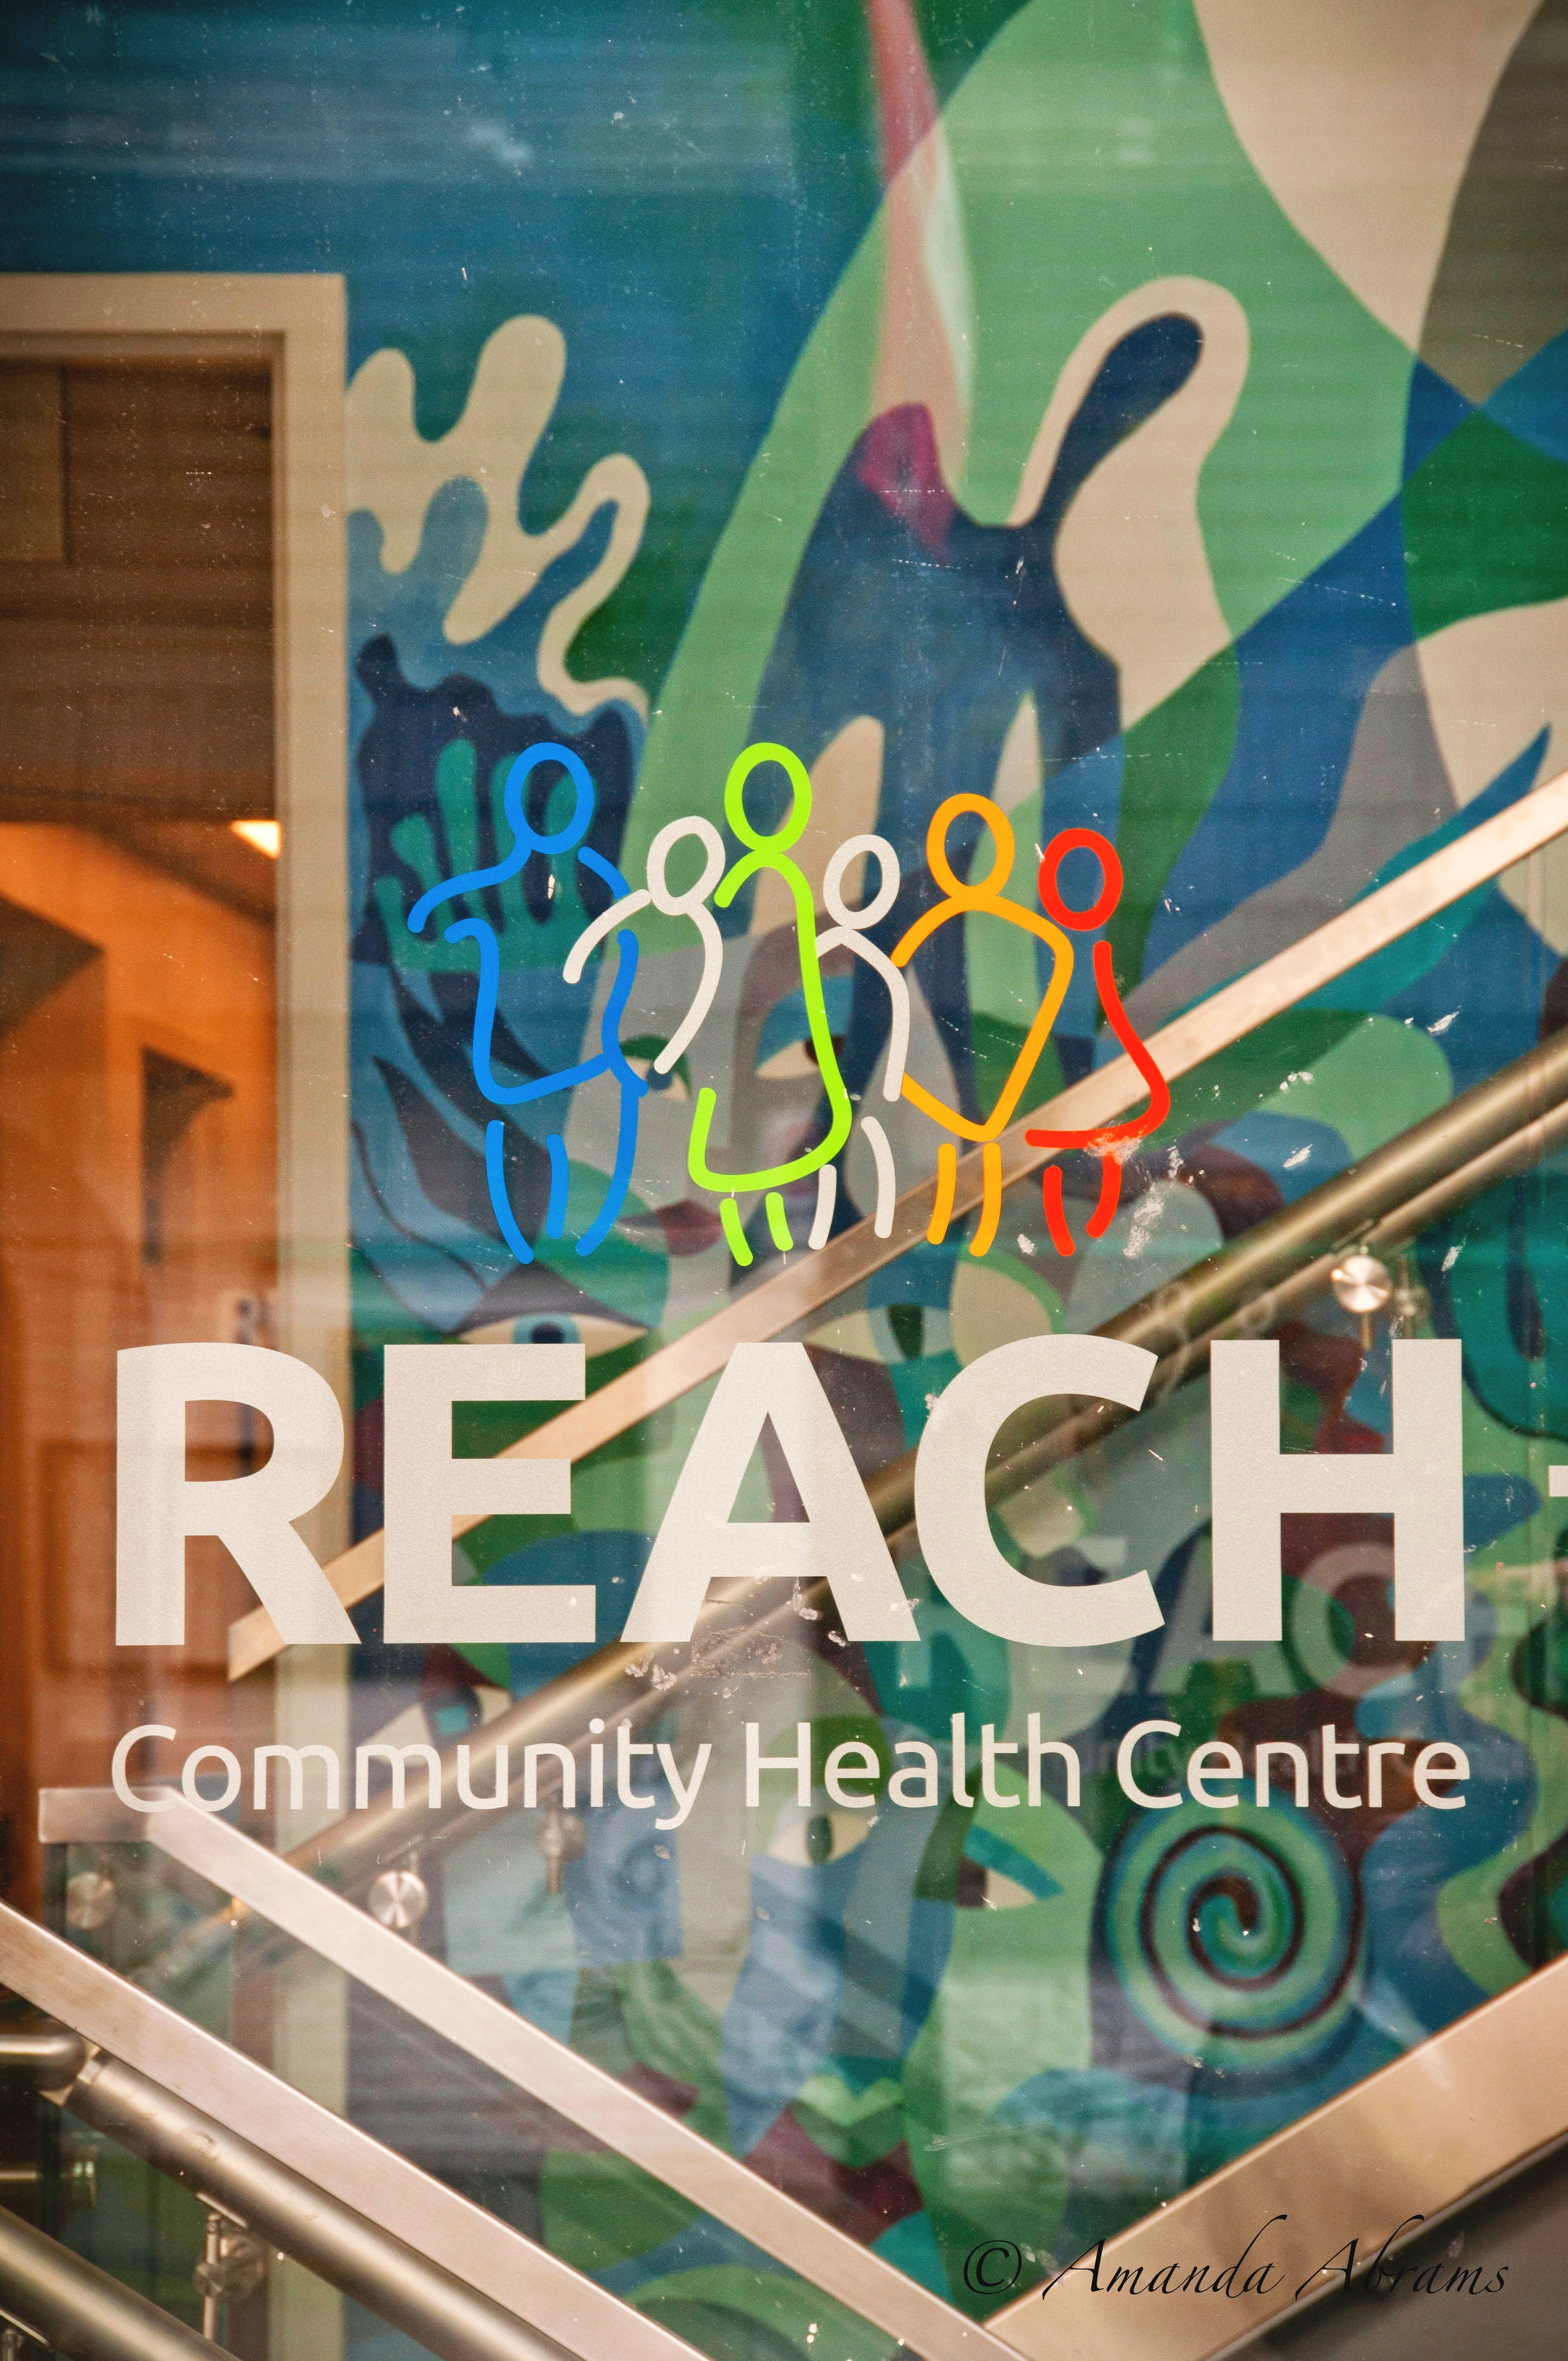 REACH Community Health Centre